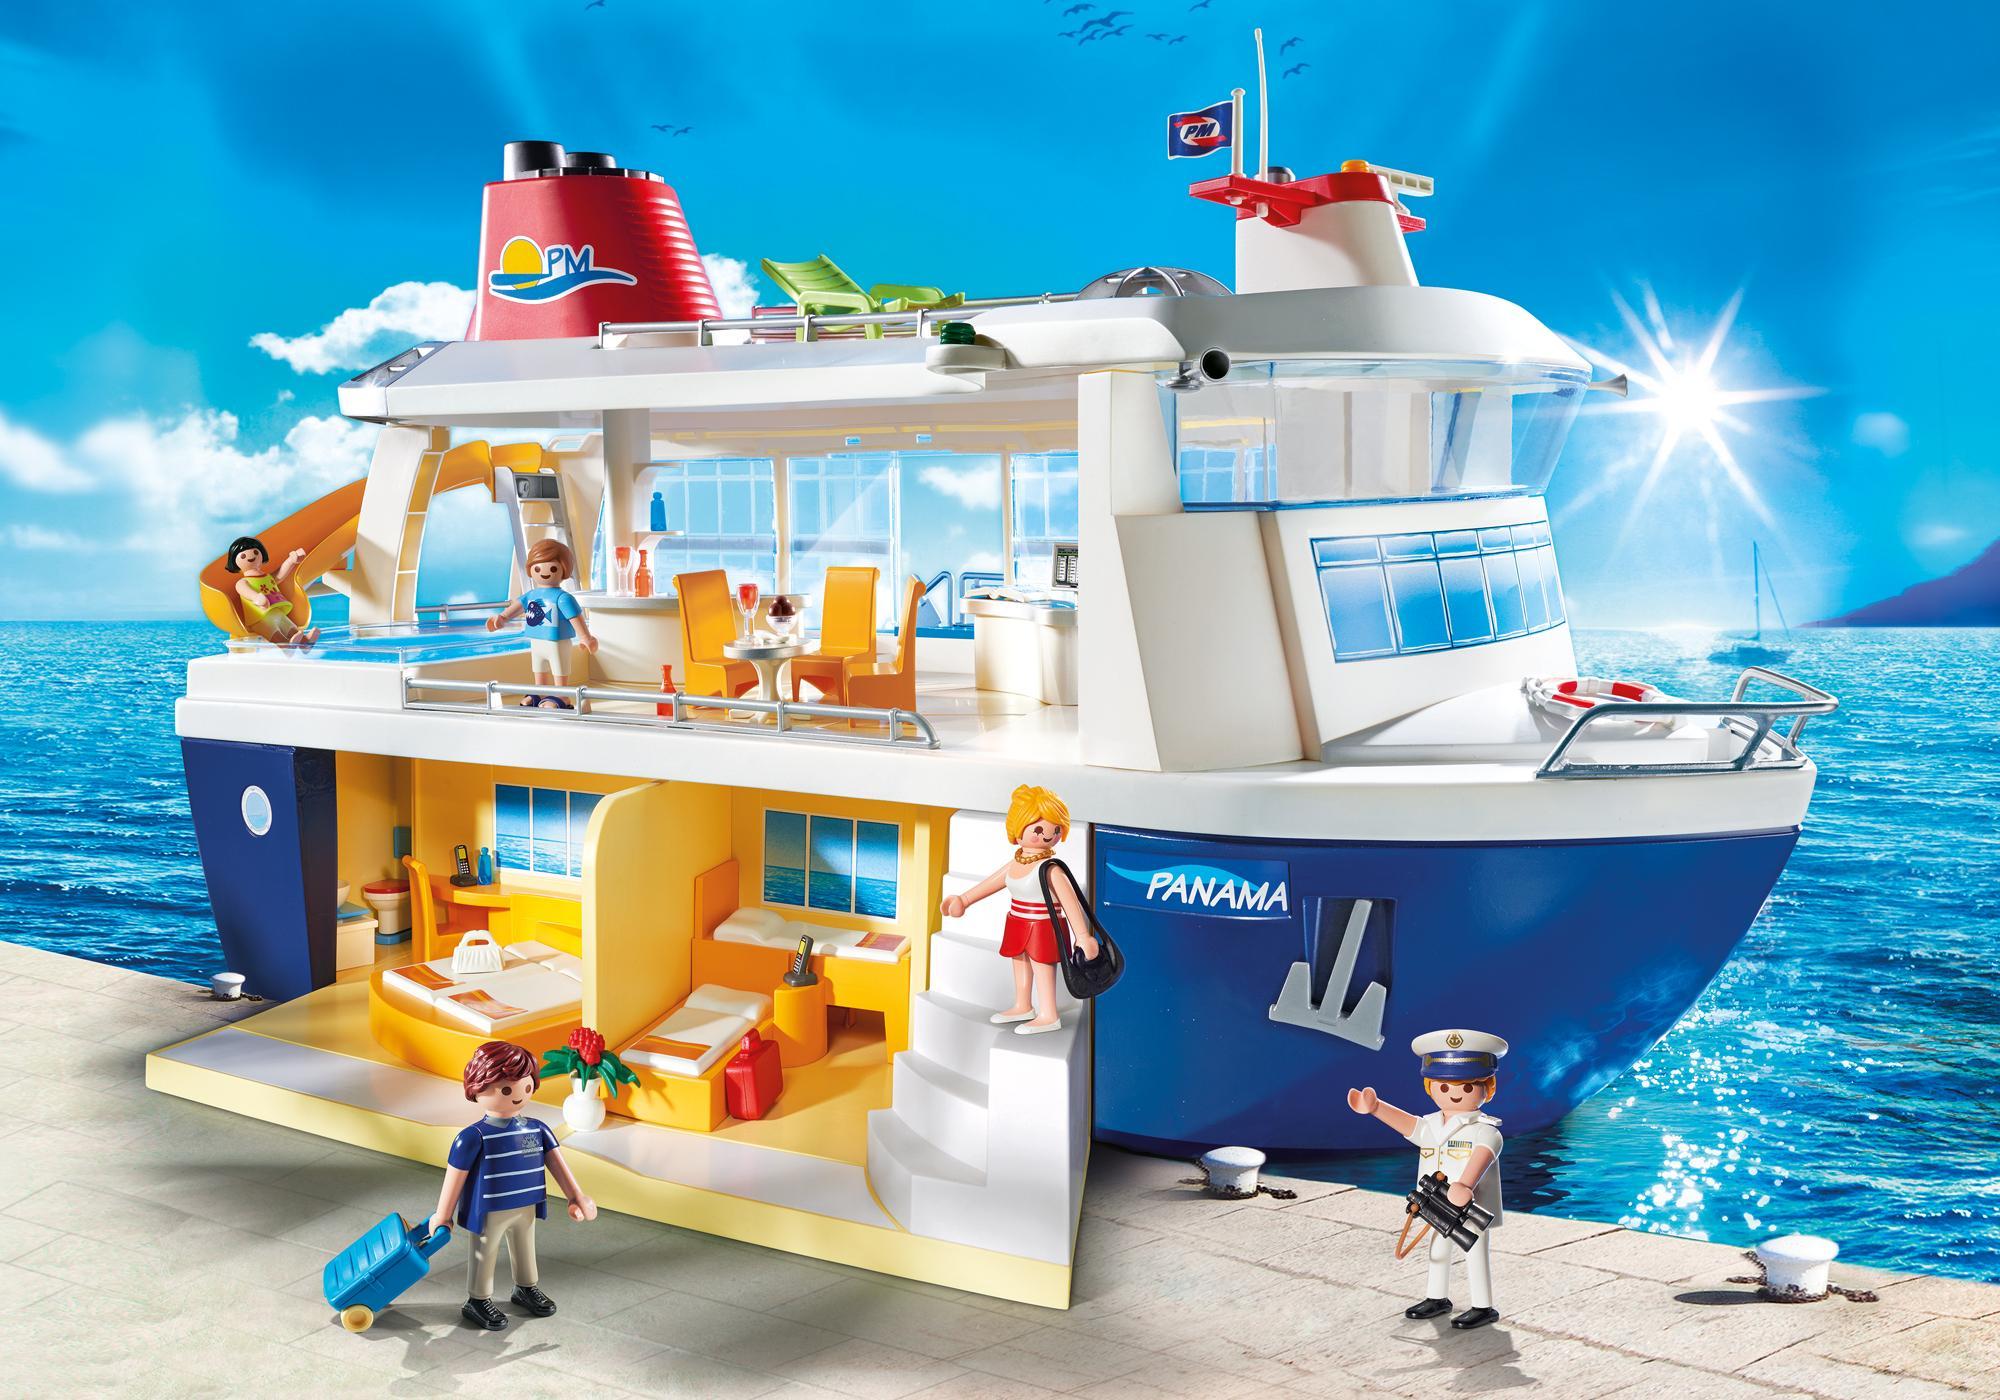 http://media.playmobil.com/i/playmobil/6978_product_detail/Kreuzfahrtschiff